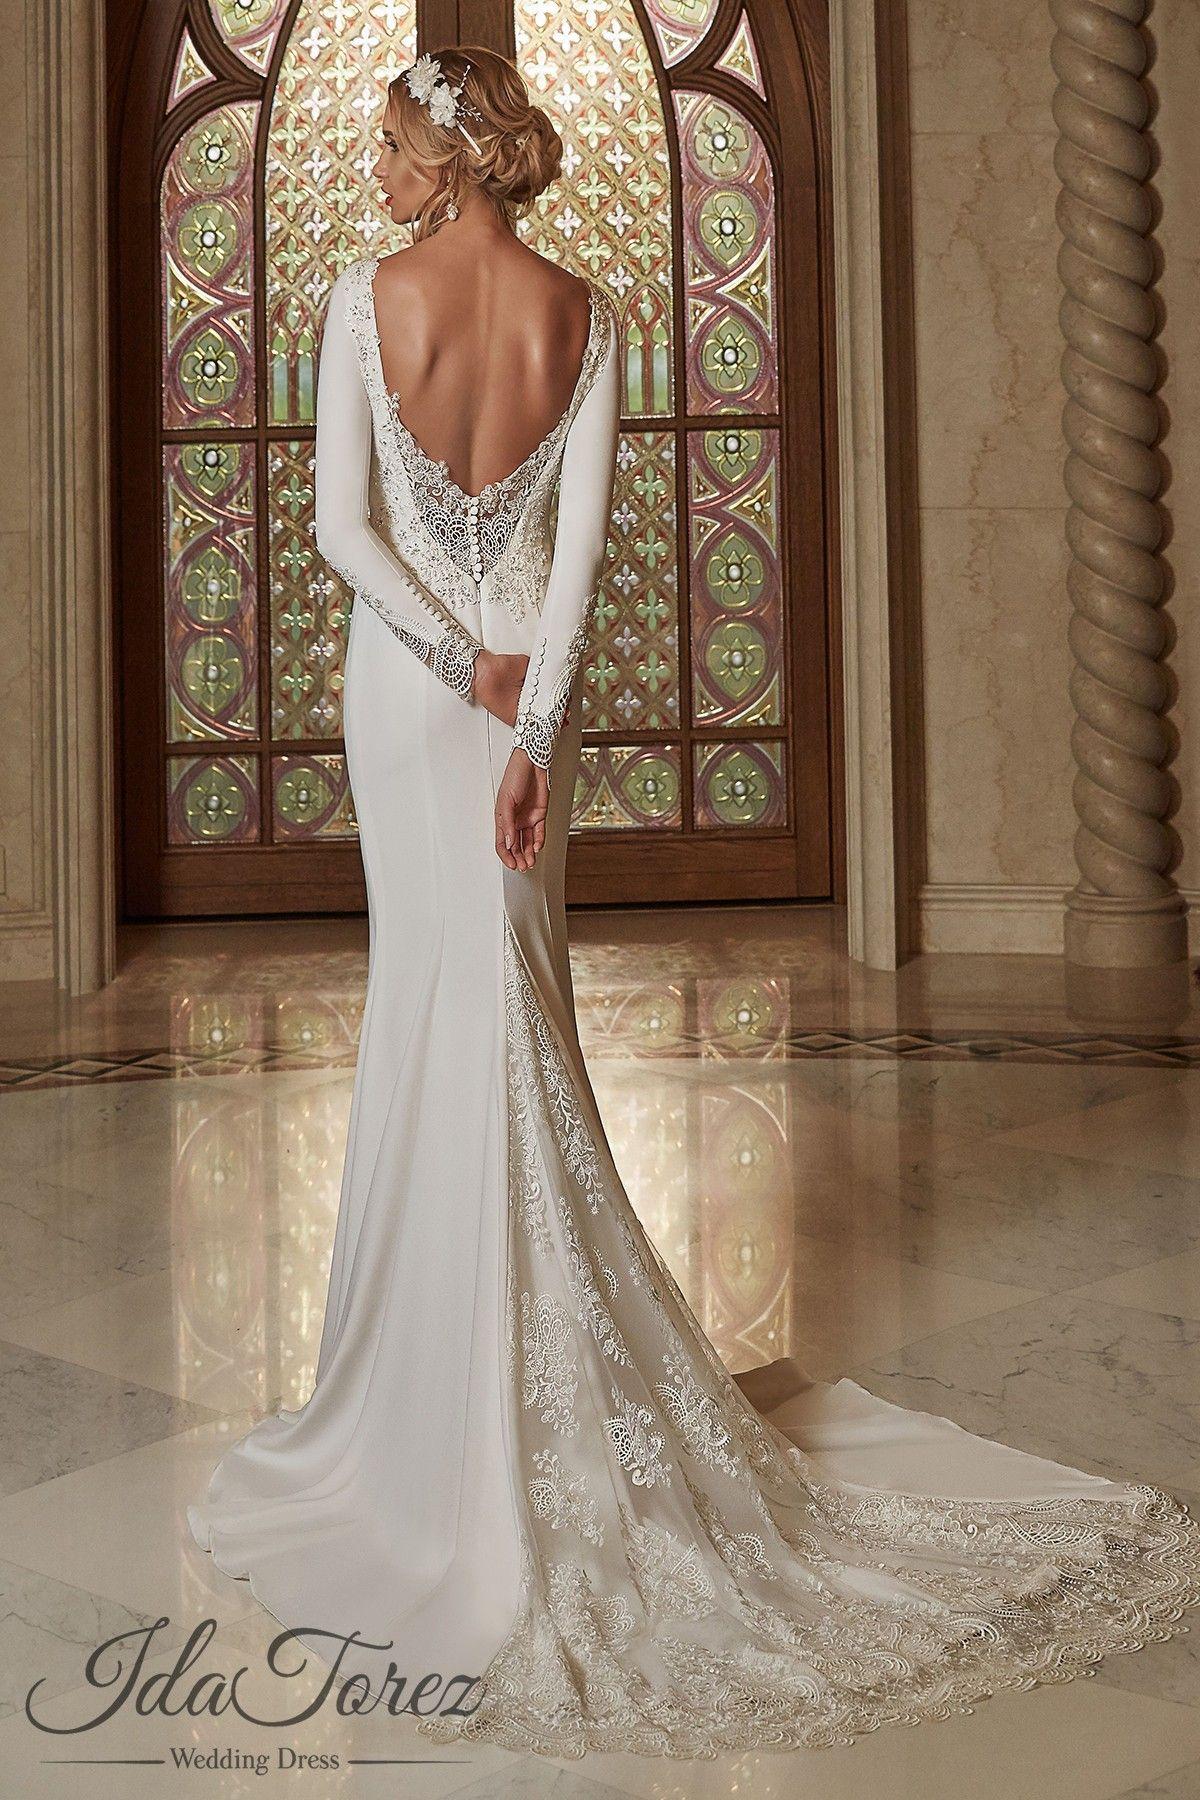 Usd 999 Trumpet Mermaid Train Stretch Crepe Wedding Dress 08006 Wedding Dresses Satin Wedding Dress Long Sleeve Applique Wedding Dress [ 1800 x 1200 Pixel ]